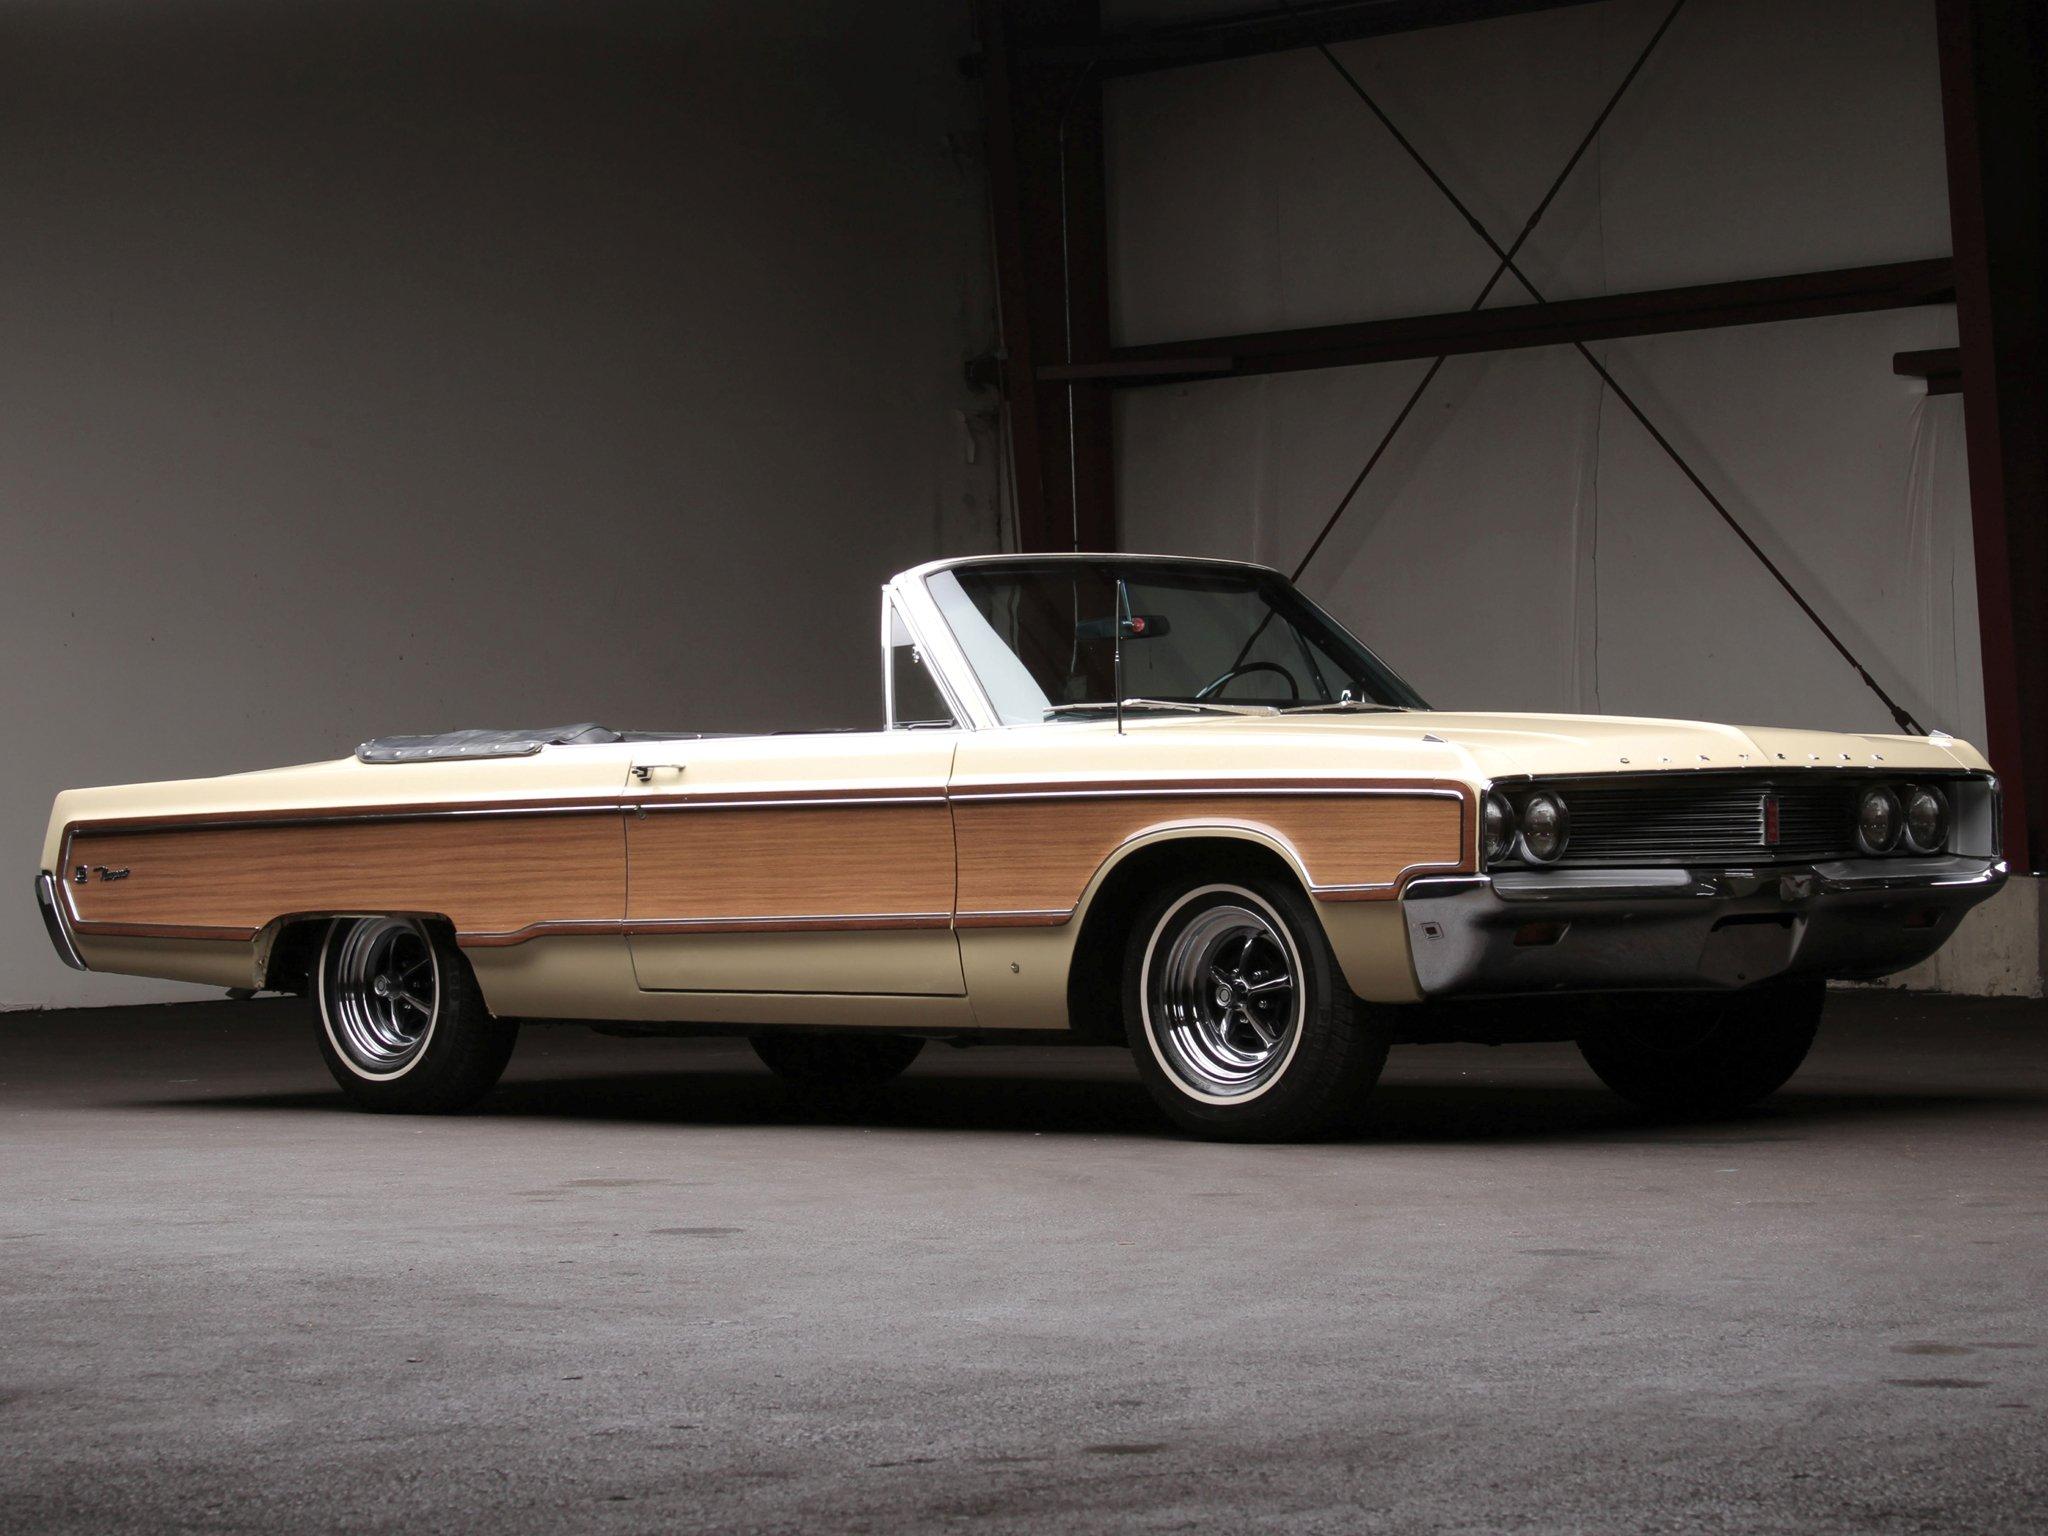 1968 chrysler newport convertible ce27 classic g. Black Bedroom Furniture Sets. Home Design Ideas